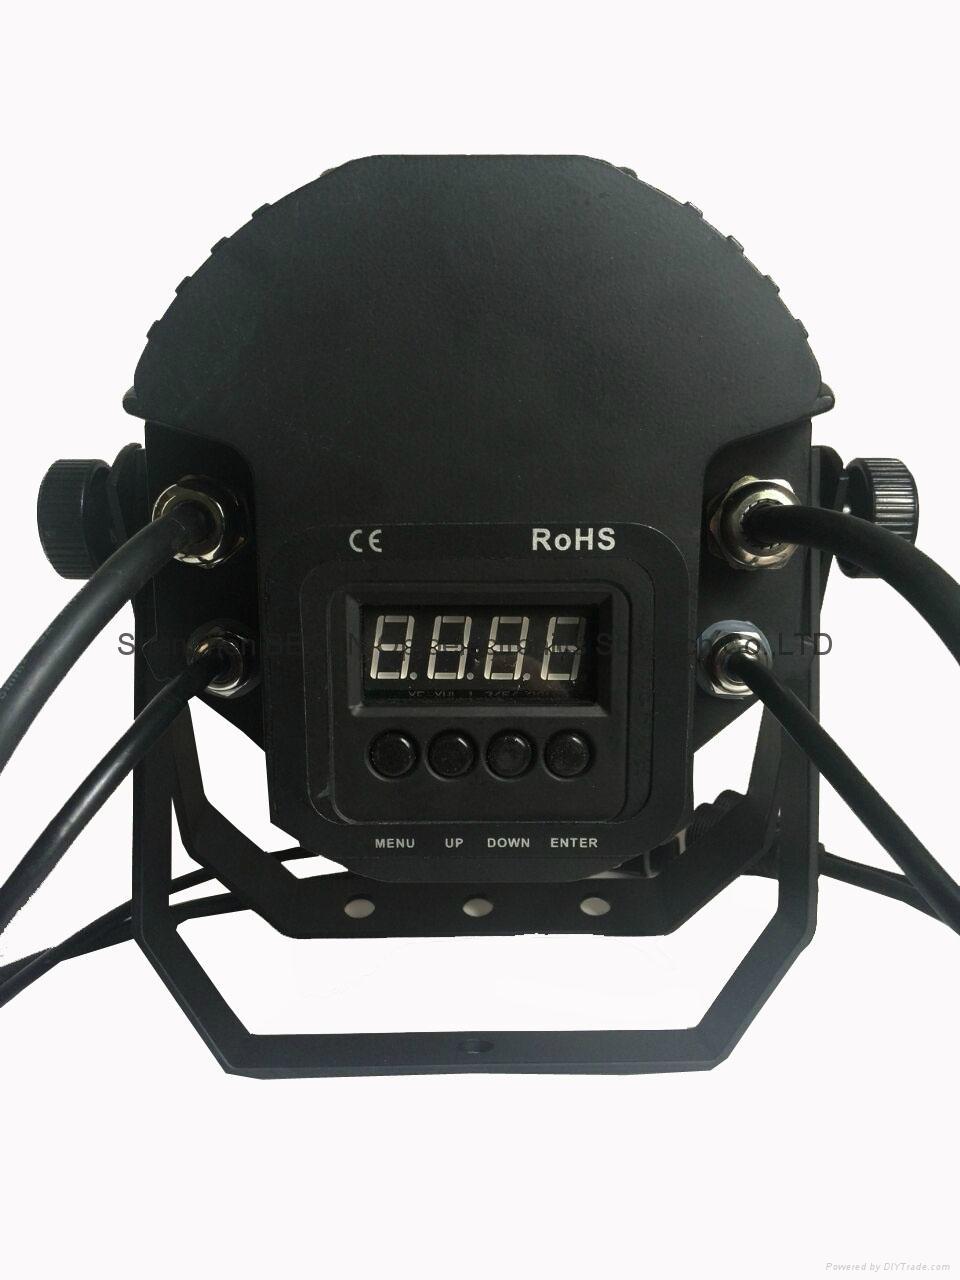 12X18w rgbwa-uv 6in1 waterproof led par light IP65 4